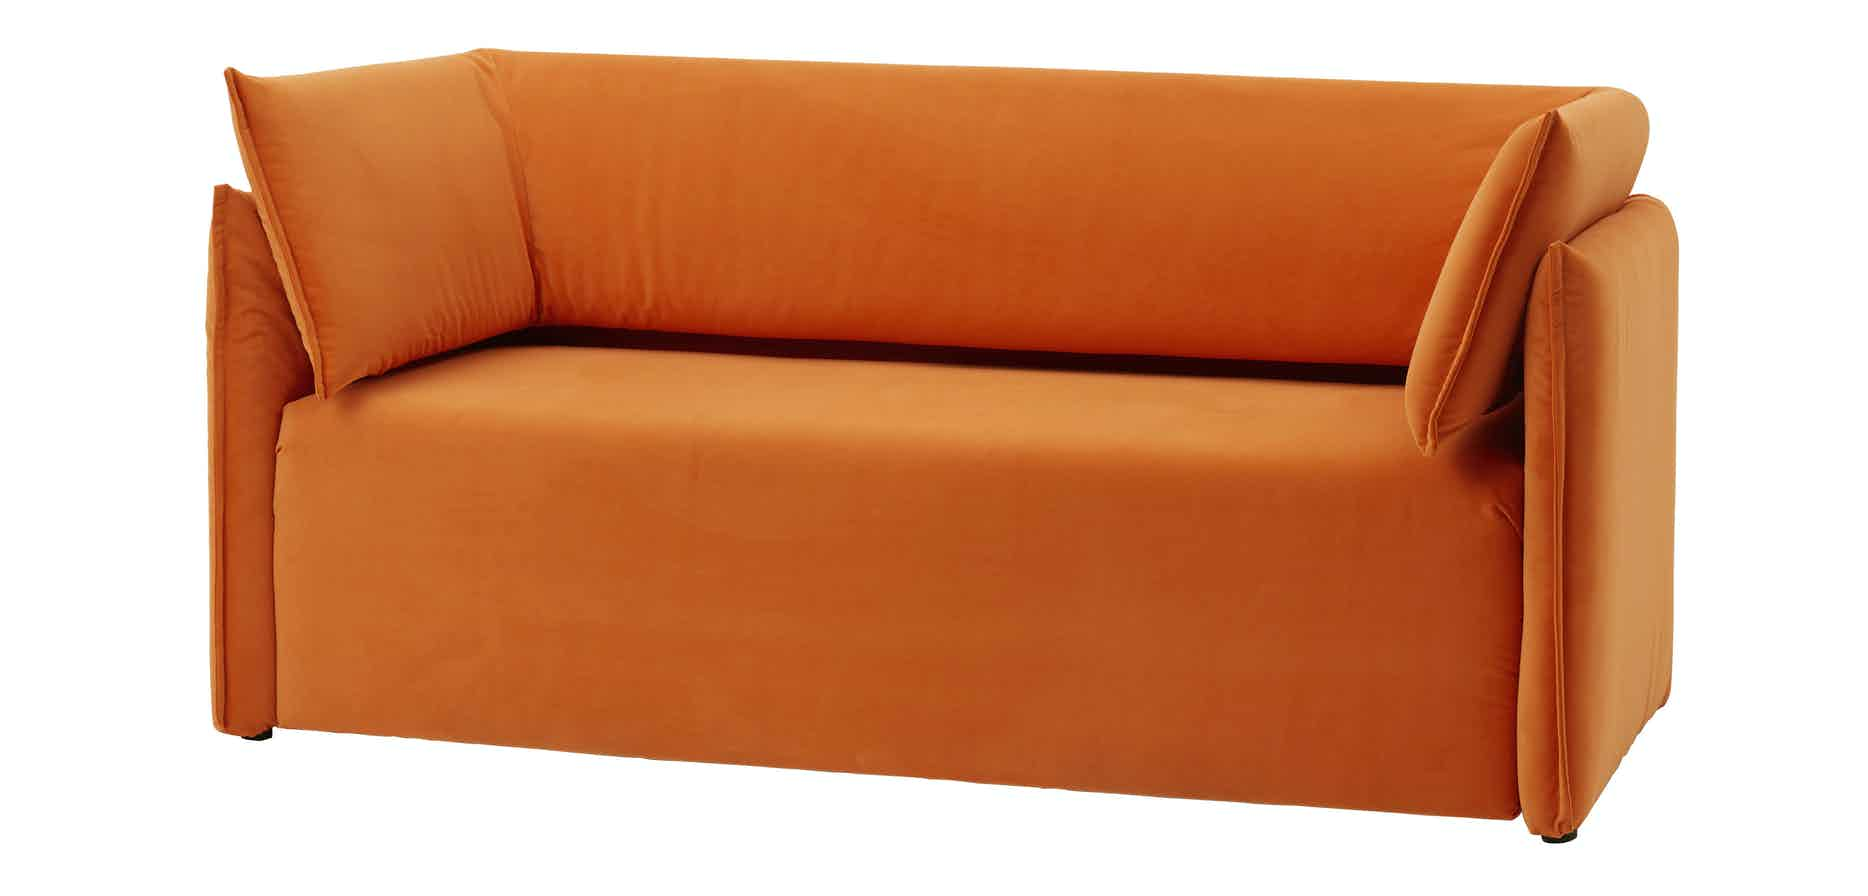 Articles-furniture-orange-boxlike-sofa-haute-living